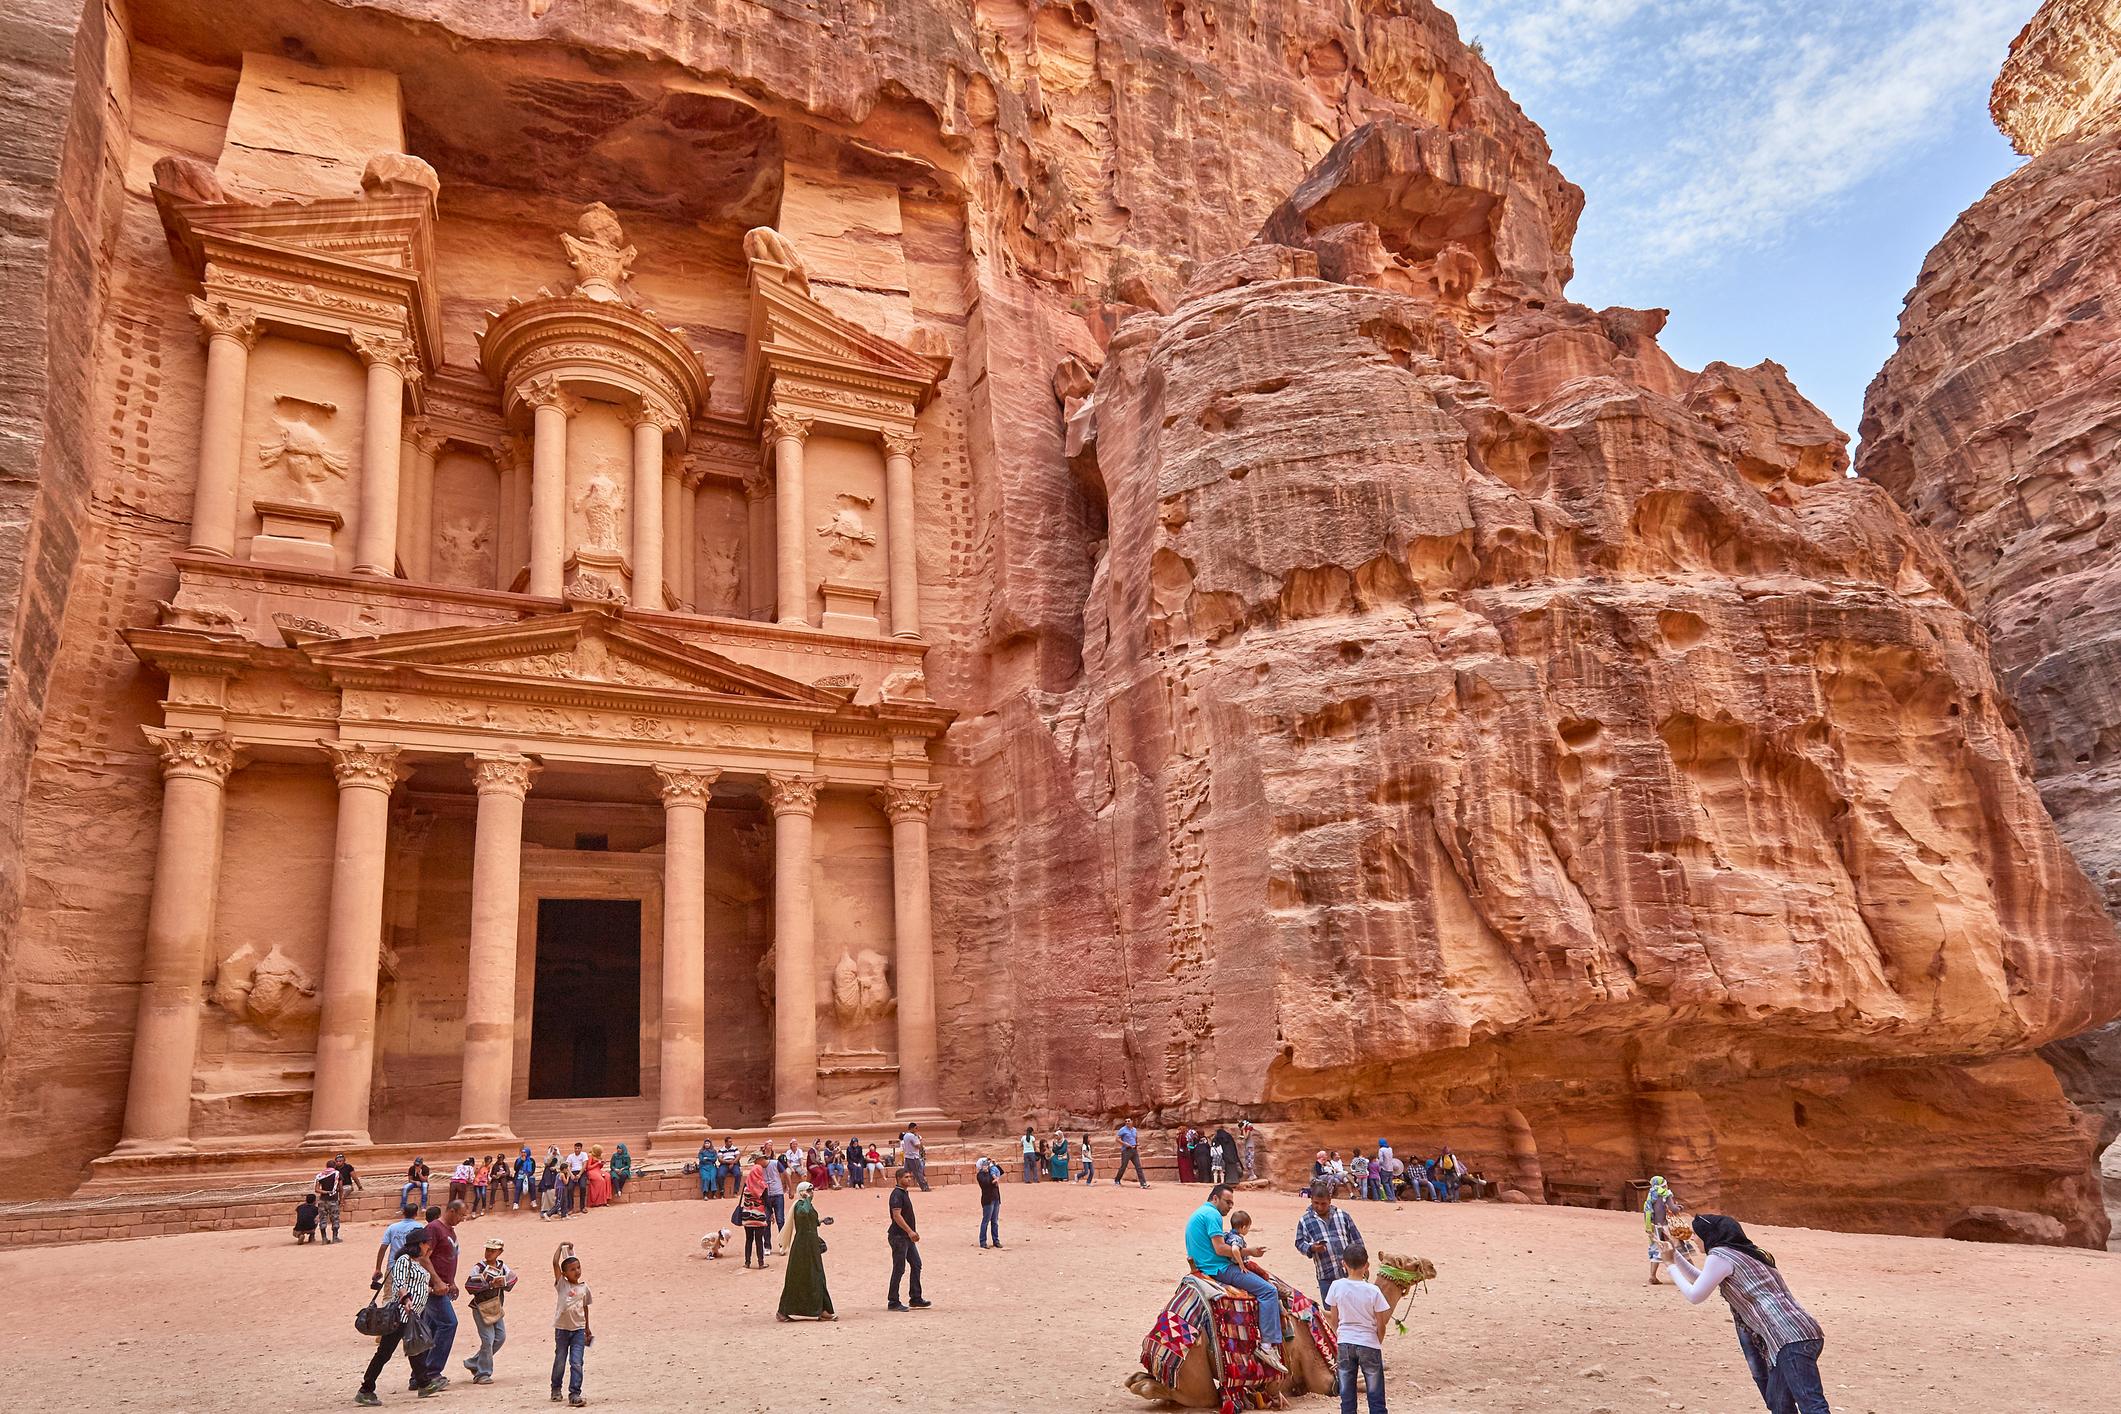 Jordan is trailblazing in the Middle East